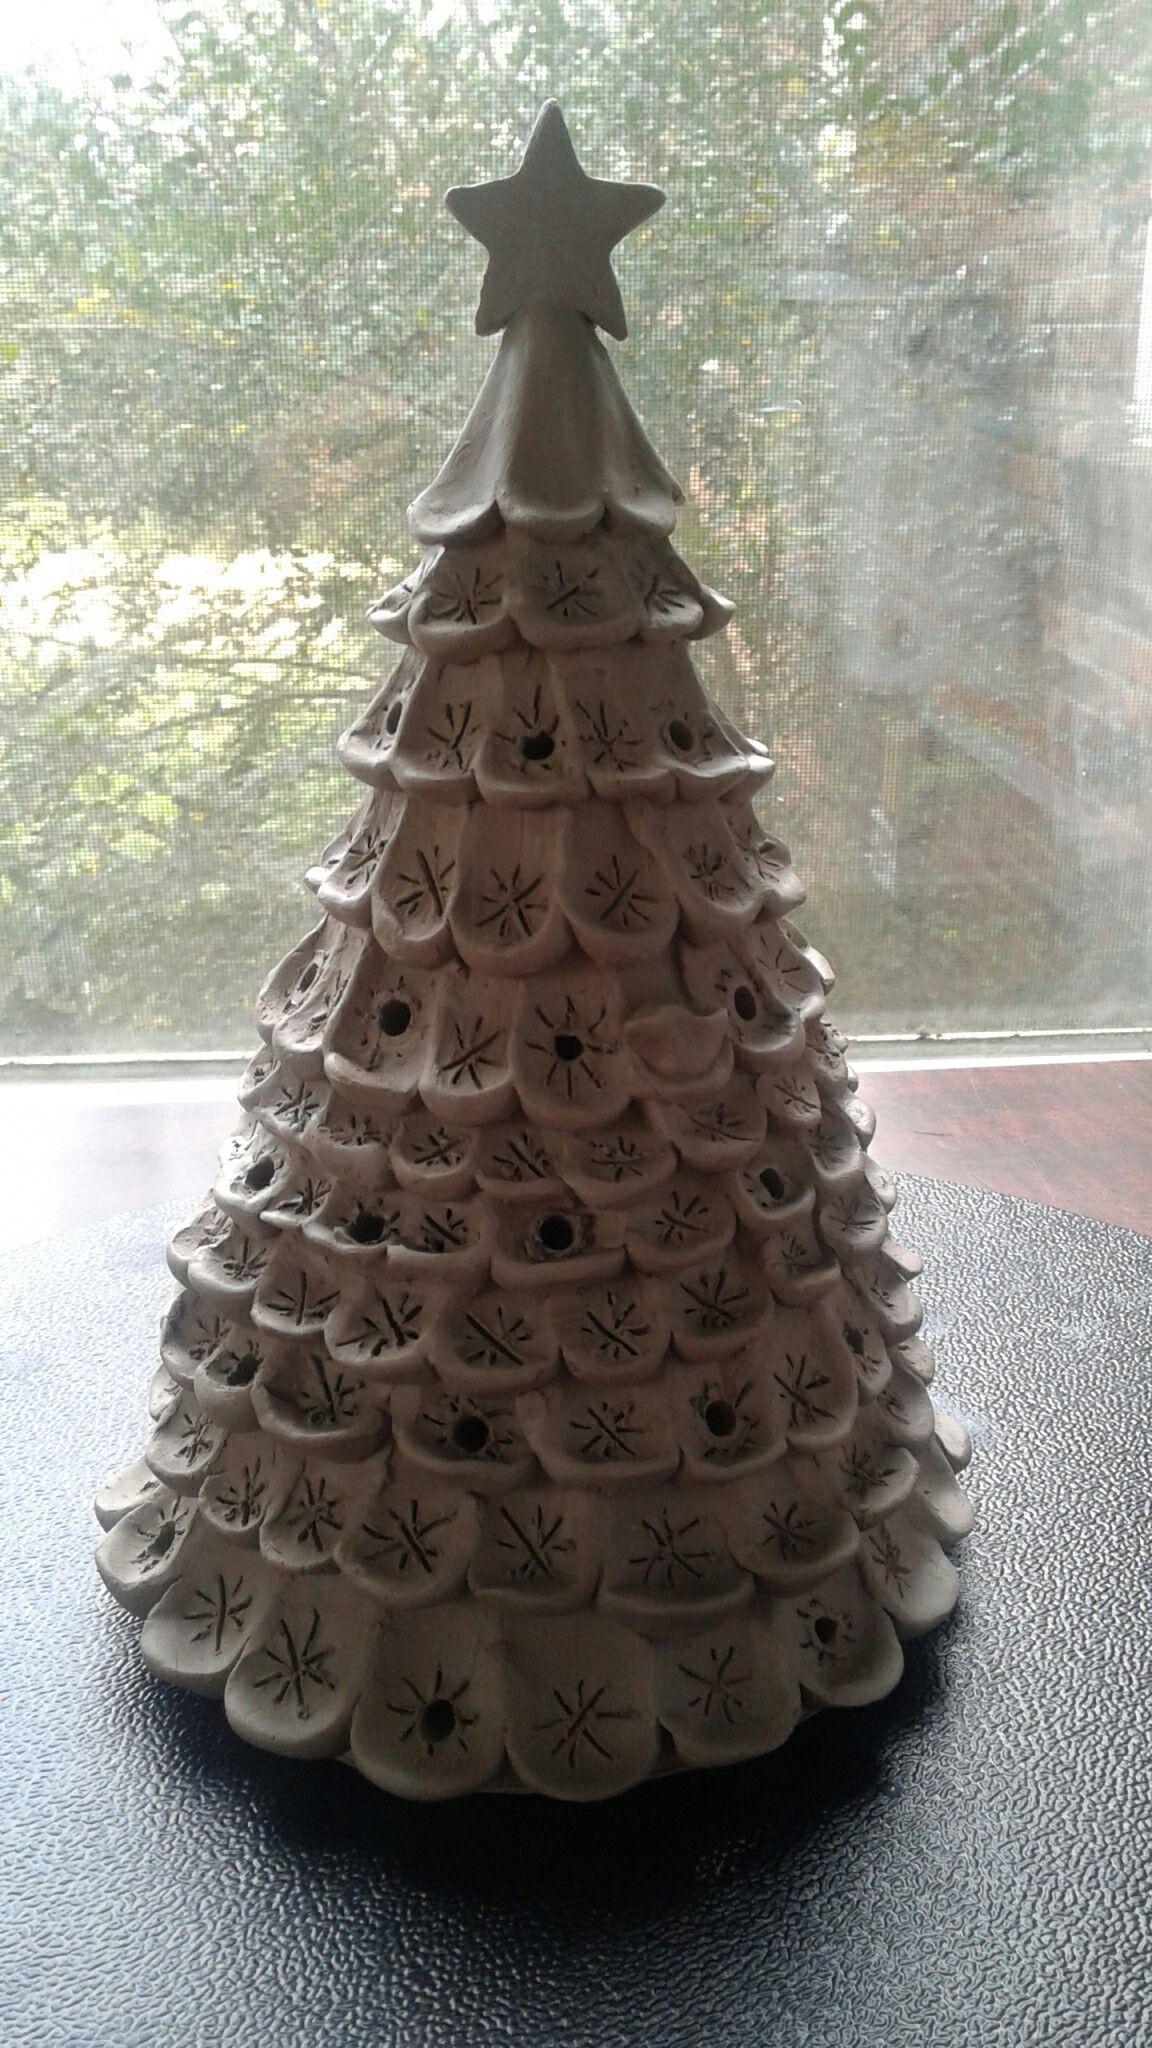 Christmas Trees Pottery In 2019 Pottery Ceramic Pottery Ceramics